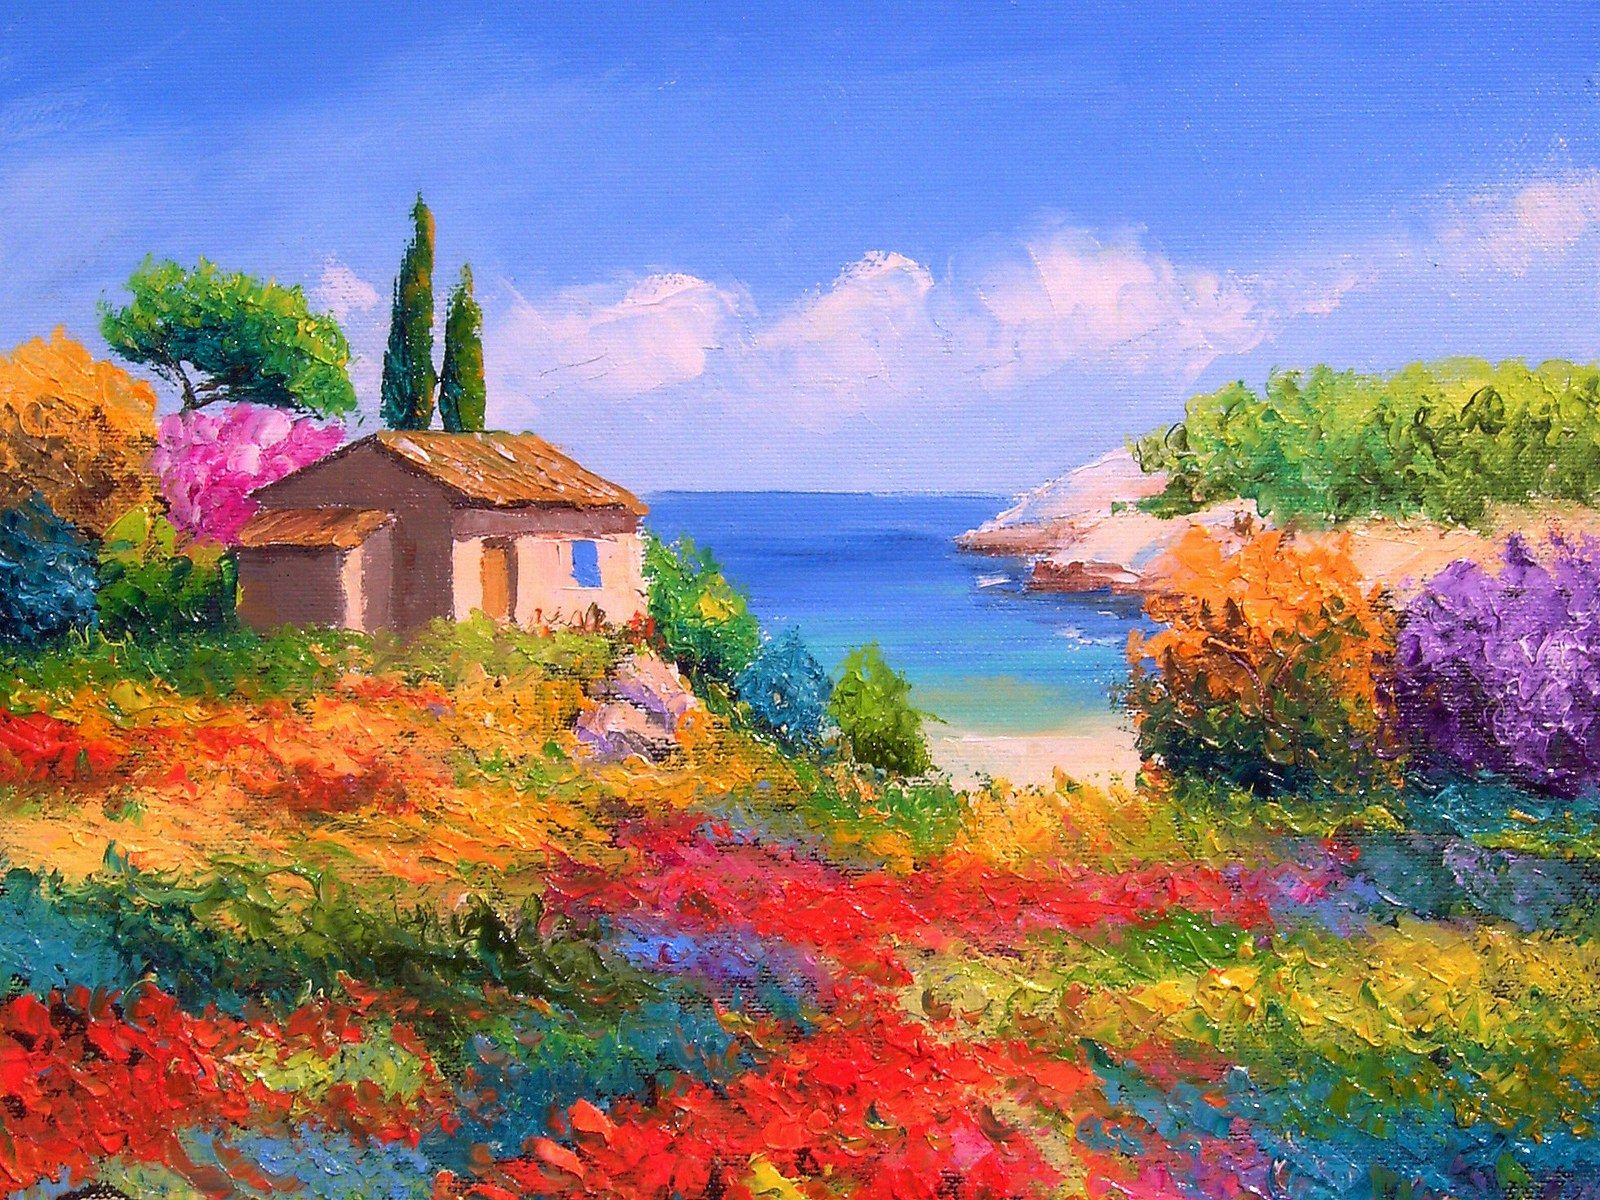 France Country Landscape Jean Marc Janiaczyk Landscape Painting With Palette Knife 1600 1200 No 16 Schone Kunstgemalde Landschaftsgemalde Aus Ol Kunstmalerei